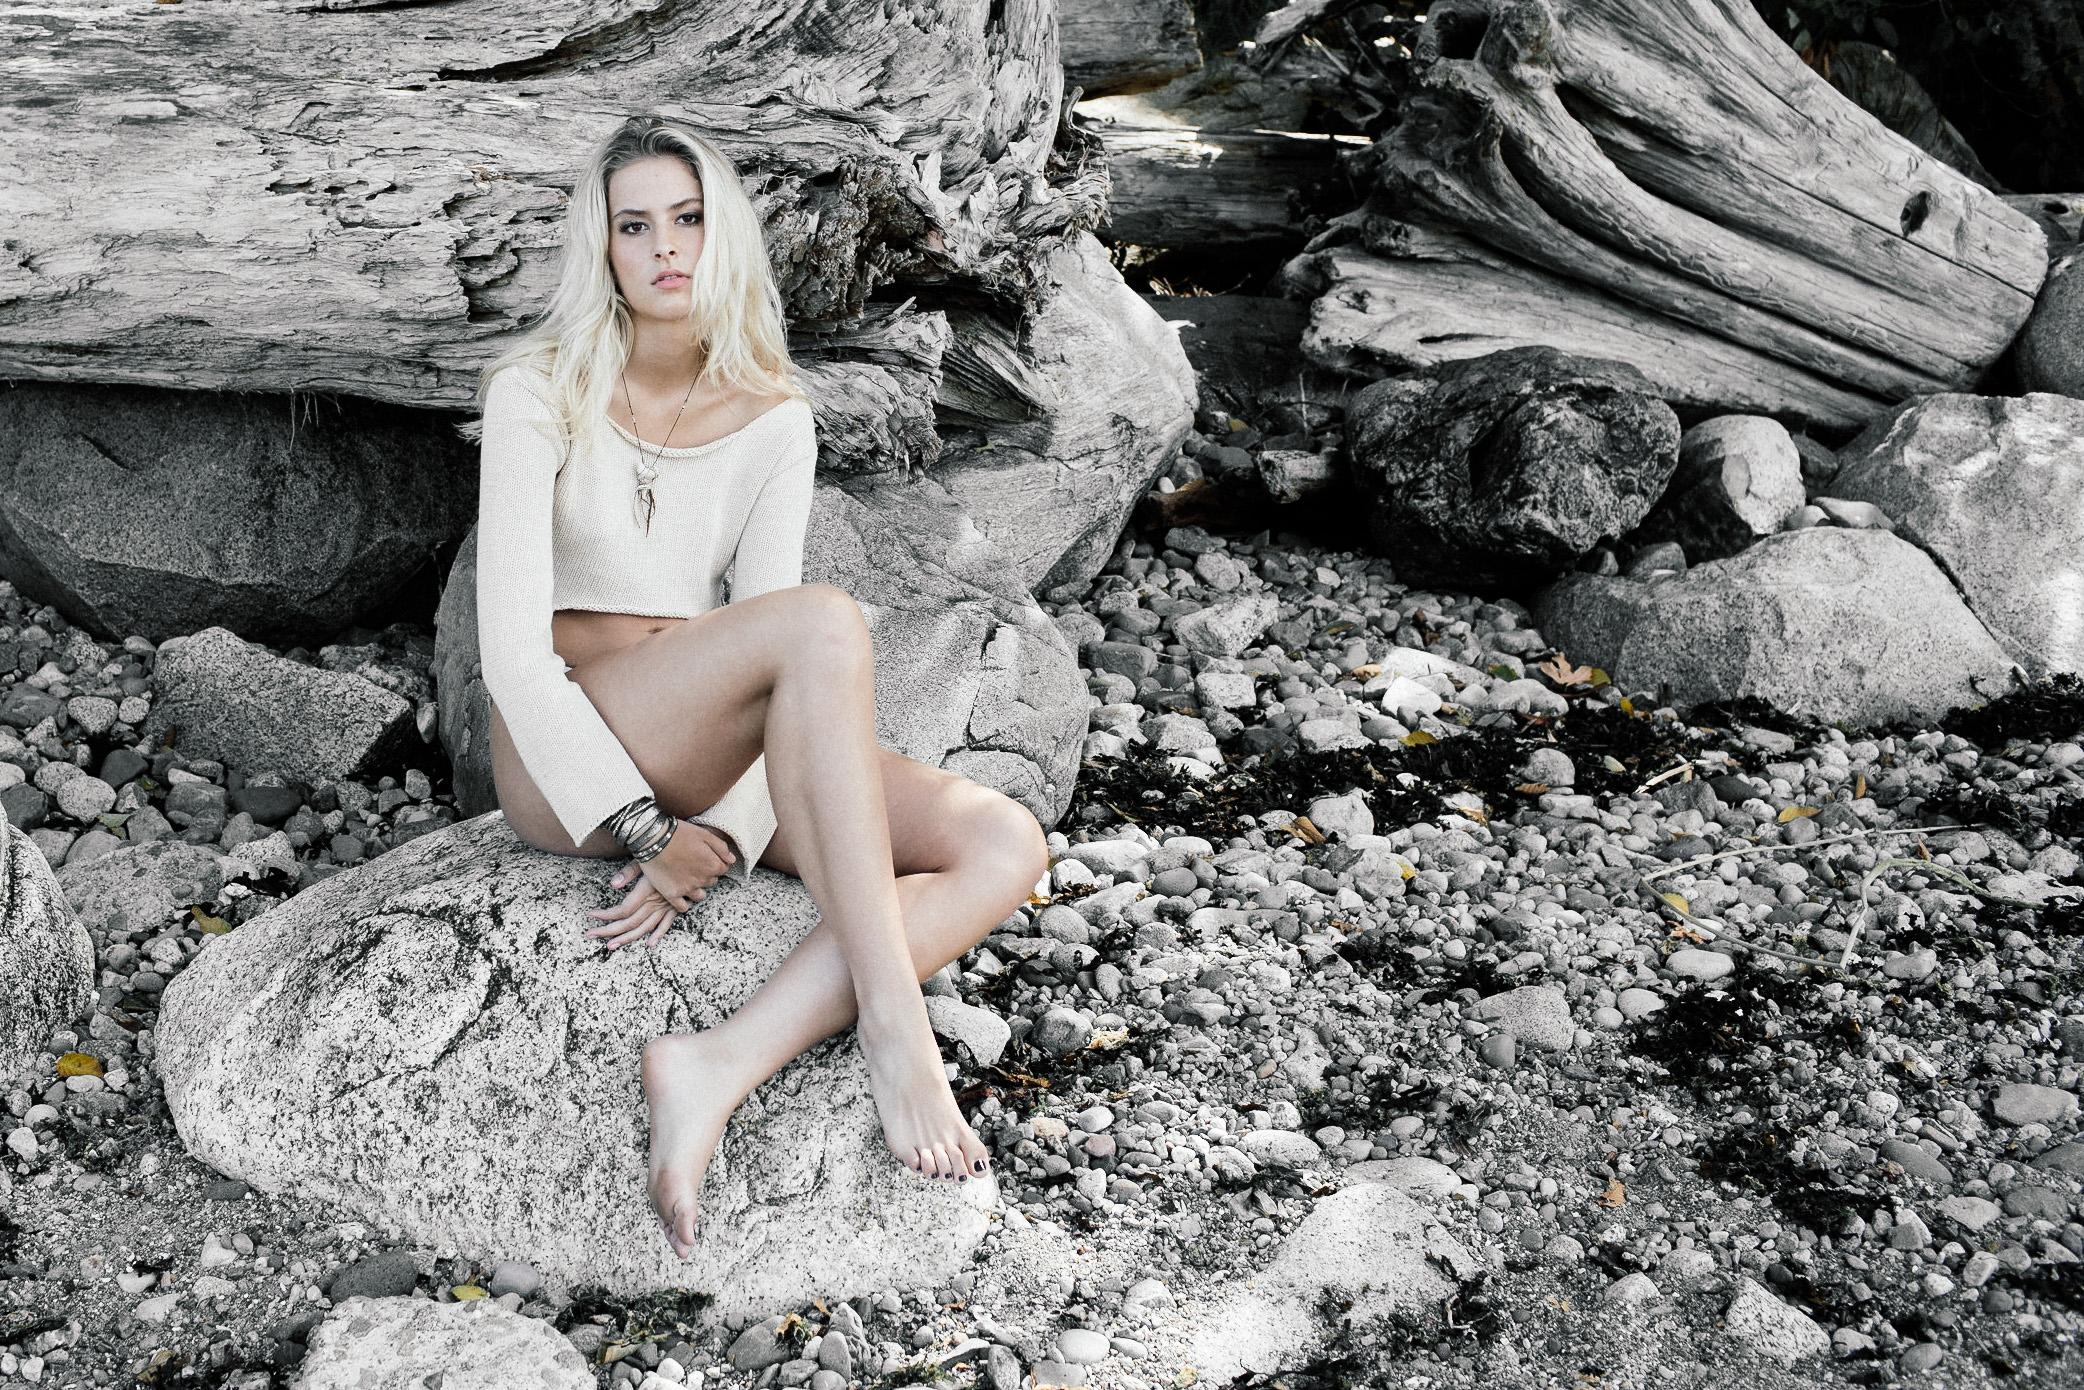 A beach editorial image of Corinne Isherwood.